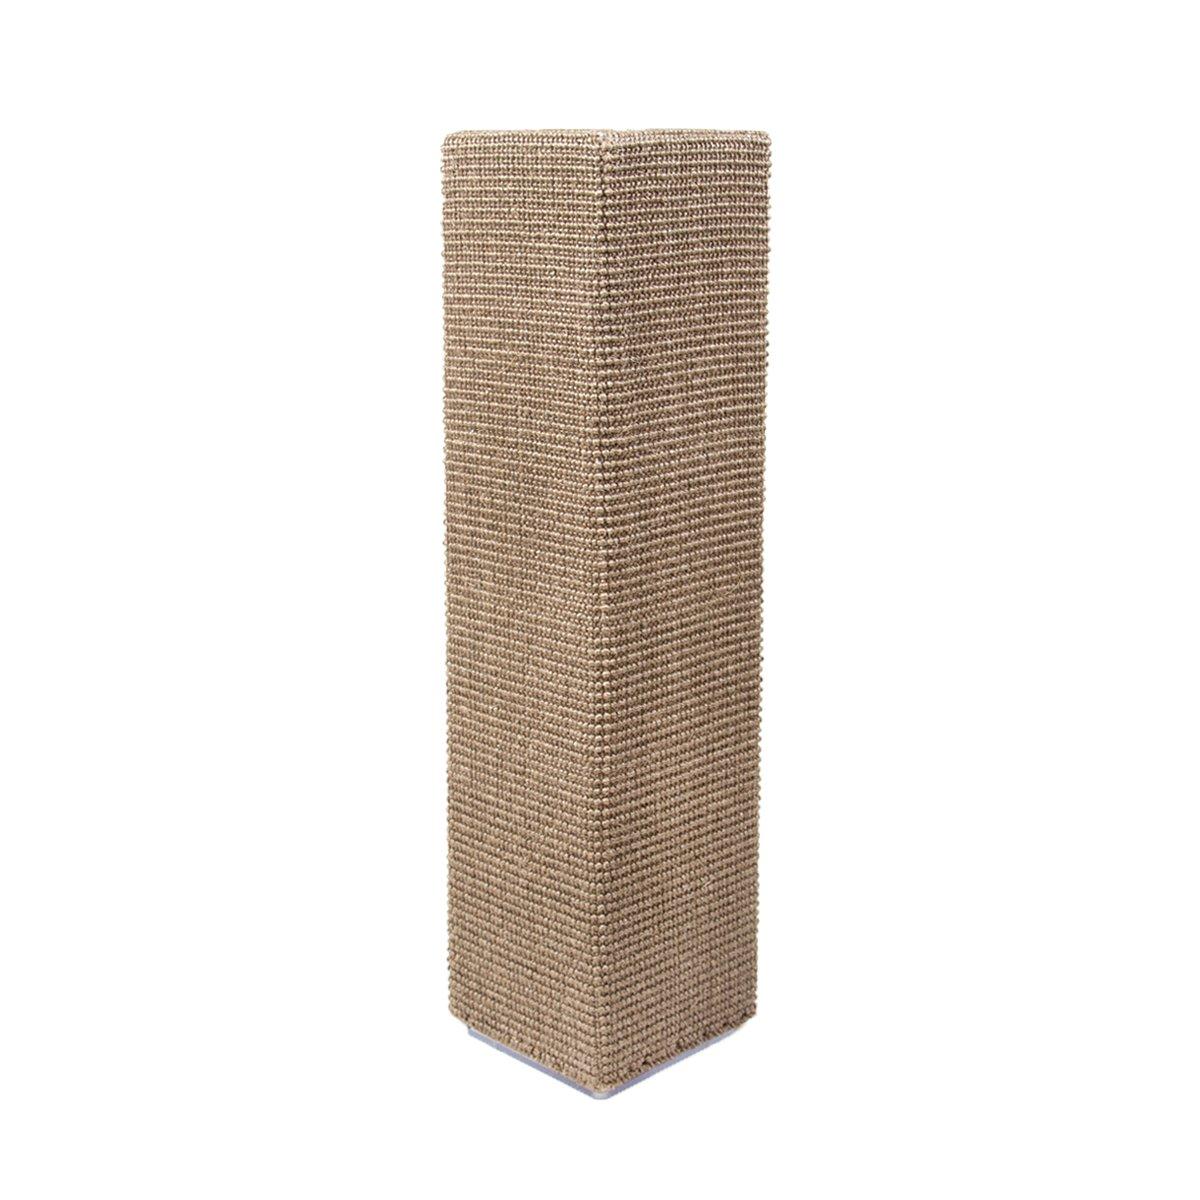 Sofa-Scratcher Squared' Cat Scratching Post & Couch-Corner/Furniture Protector (Olive)